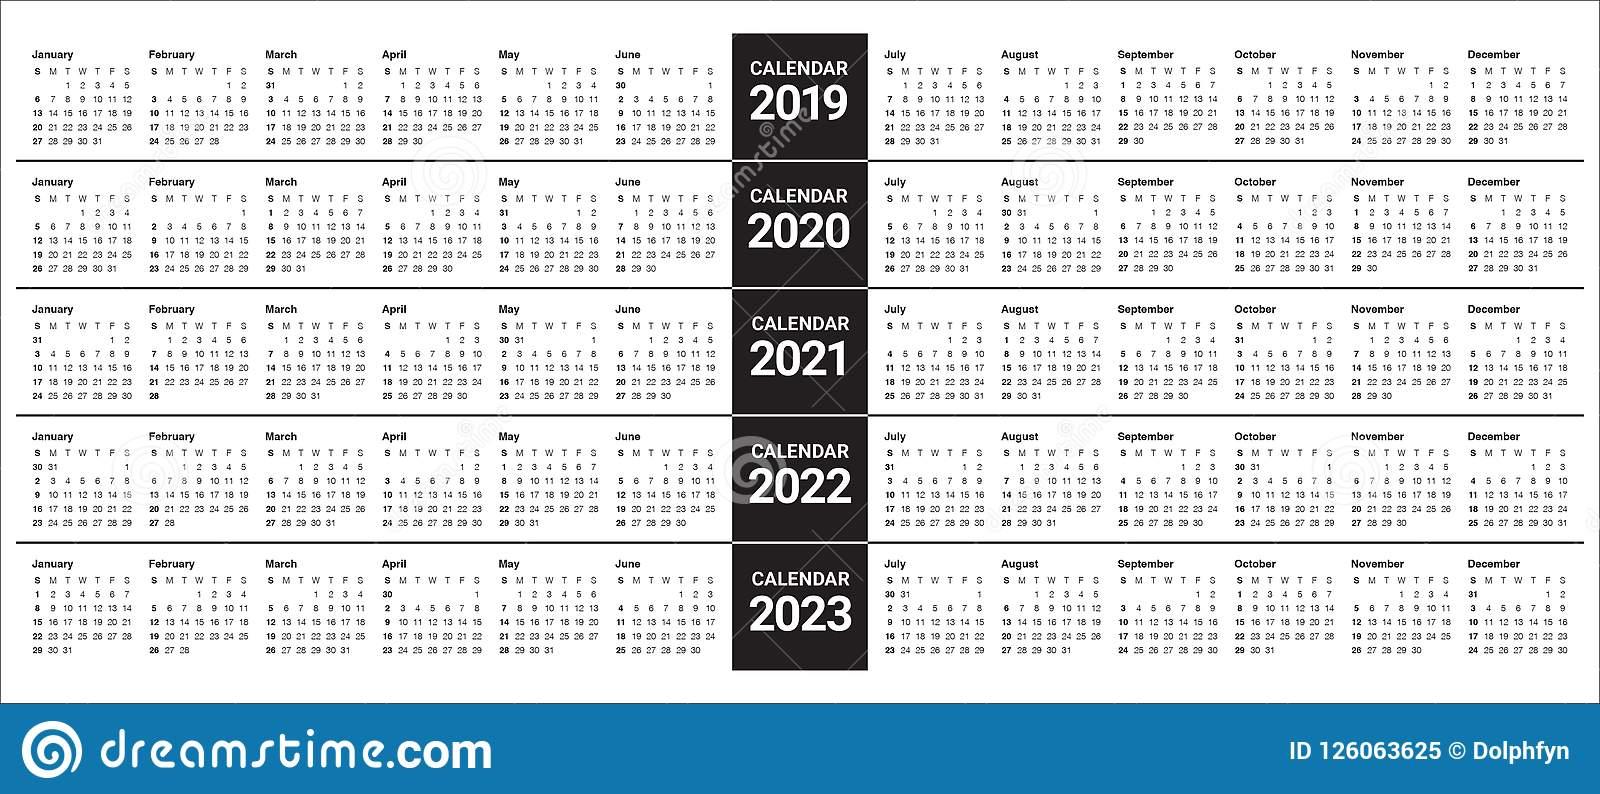 Year 2019 2020 2021 2022 2023 Calendar Vector Design In 4 5 4 Retail Calendar 2019 2022